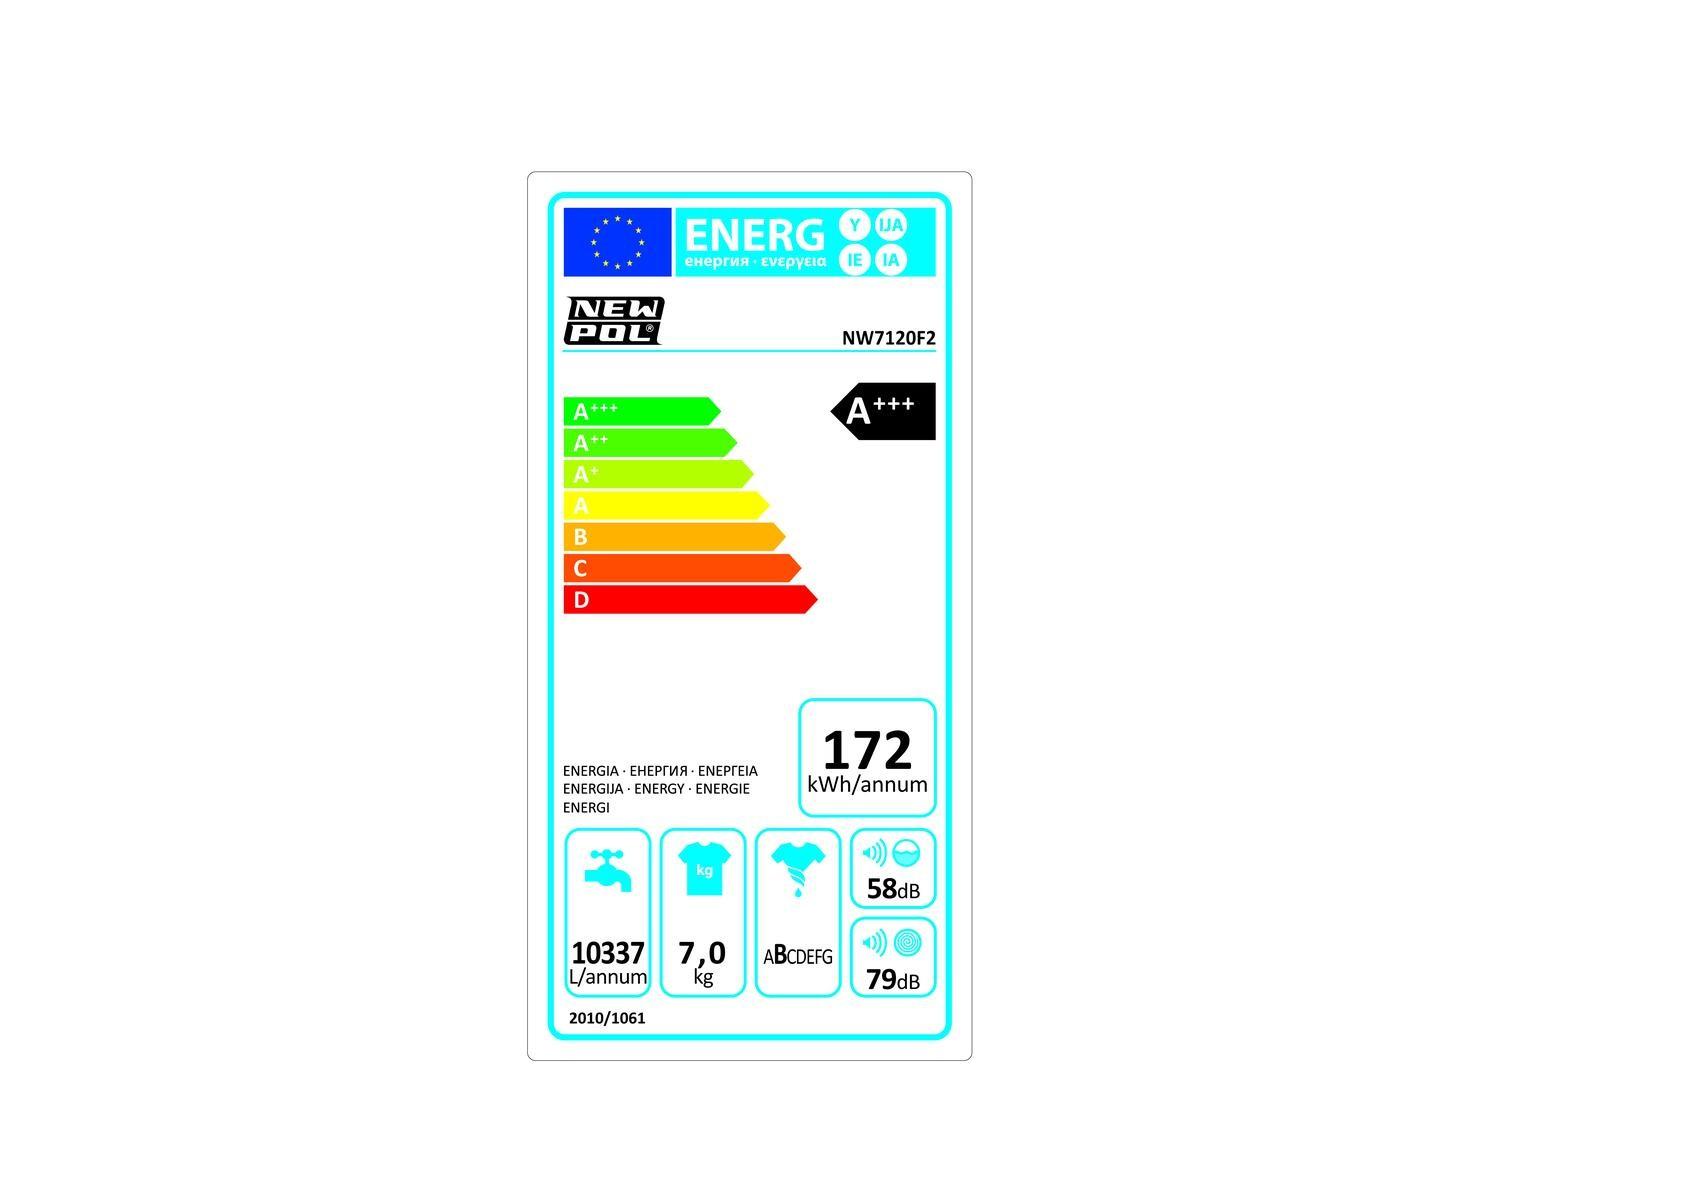 Etiqueta de Eficiencia Energética - NW7120F2